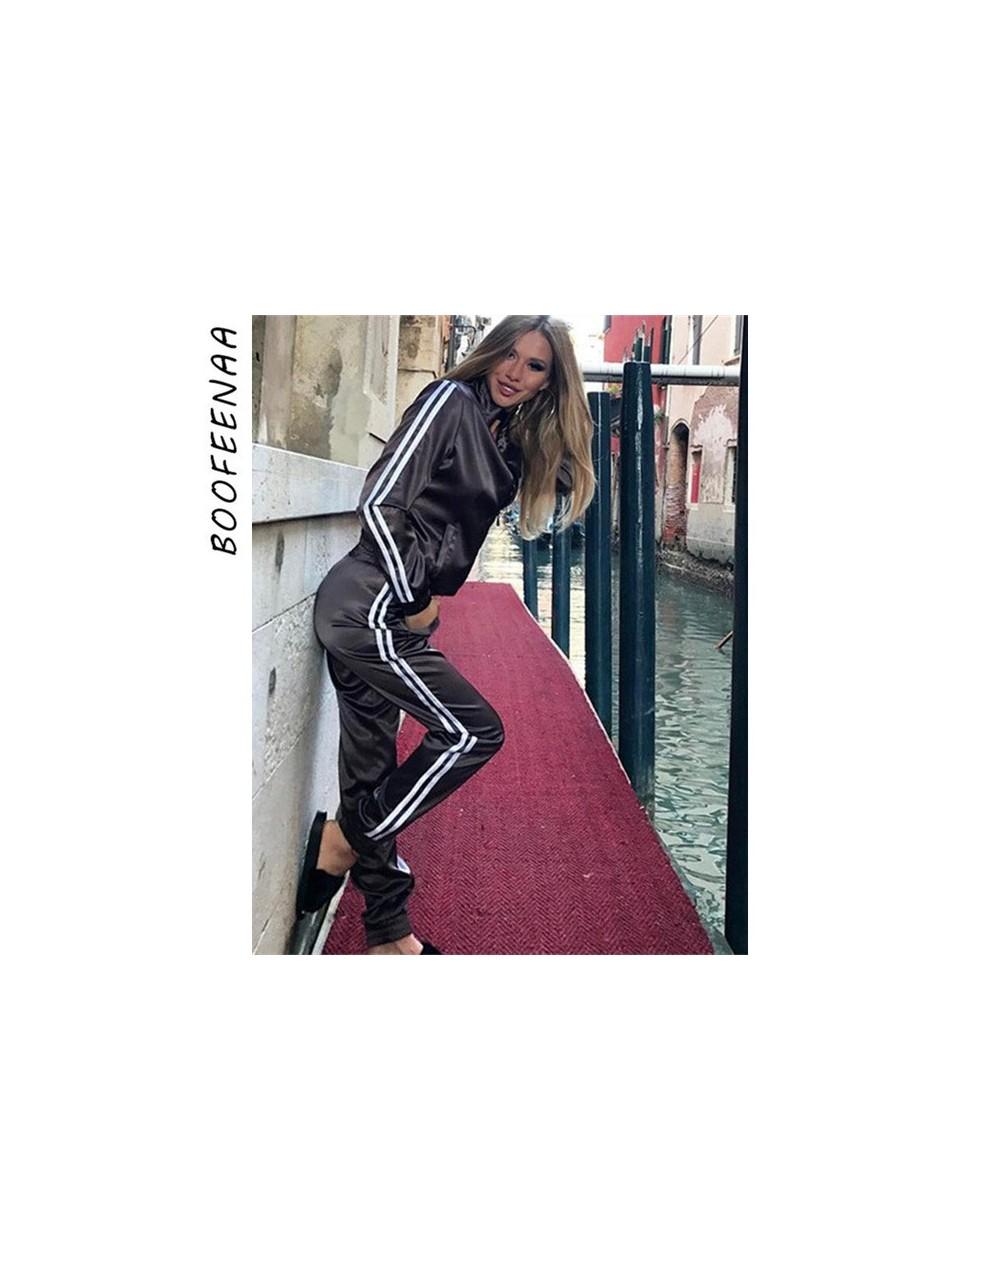 Fall 2019 Casaul Tracksuit Women 2 Piece Set Top And Pants Satin Striped Patchwork Zipper Sexy Sweatshirt Sweat Suit - Black...